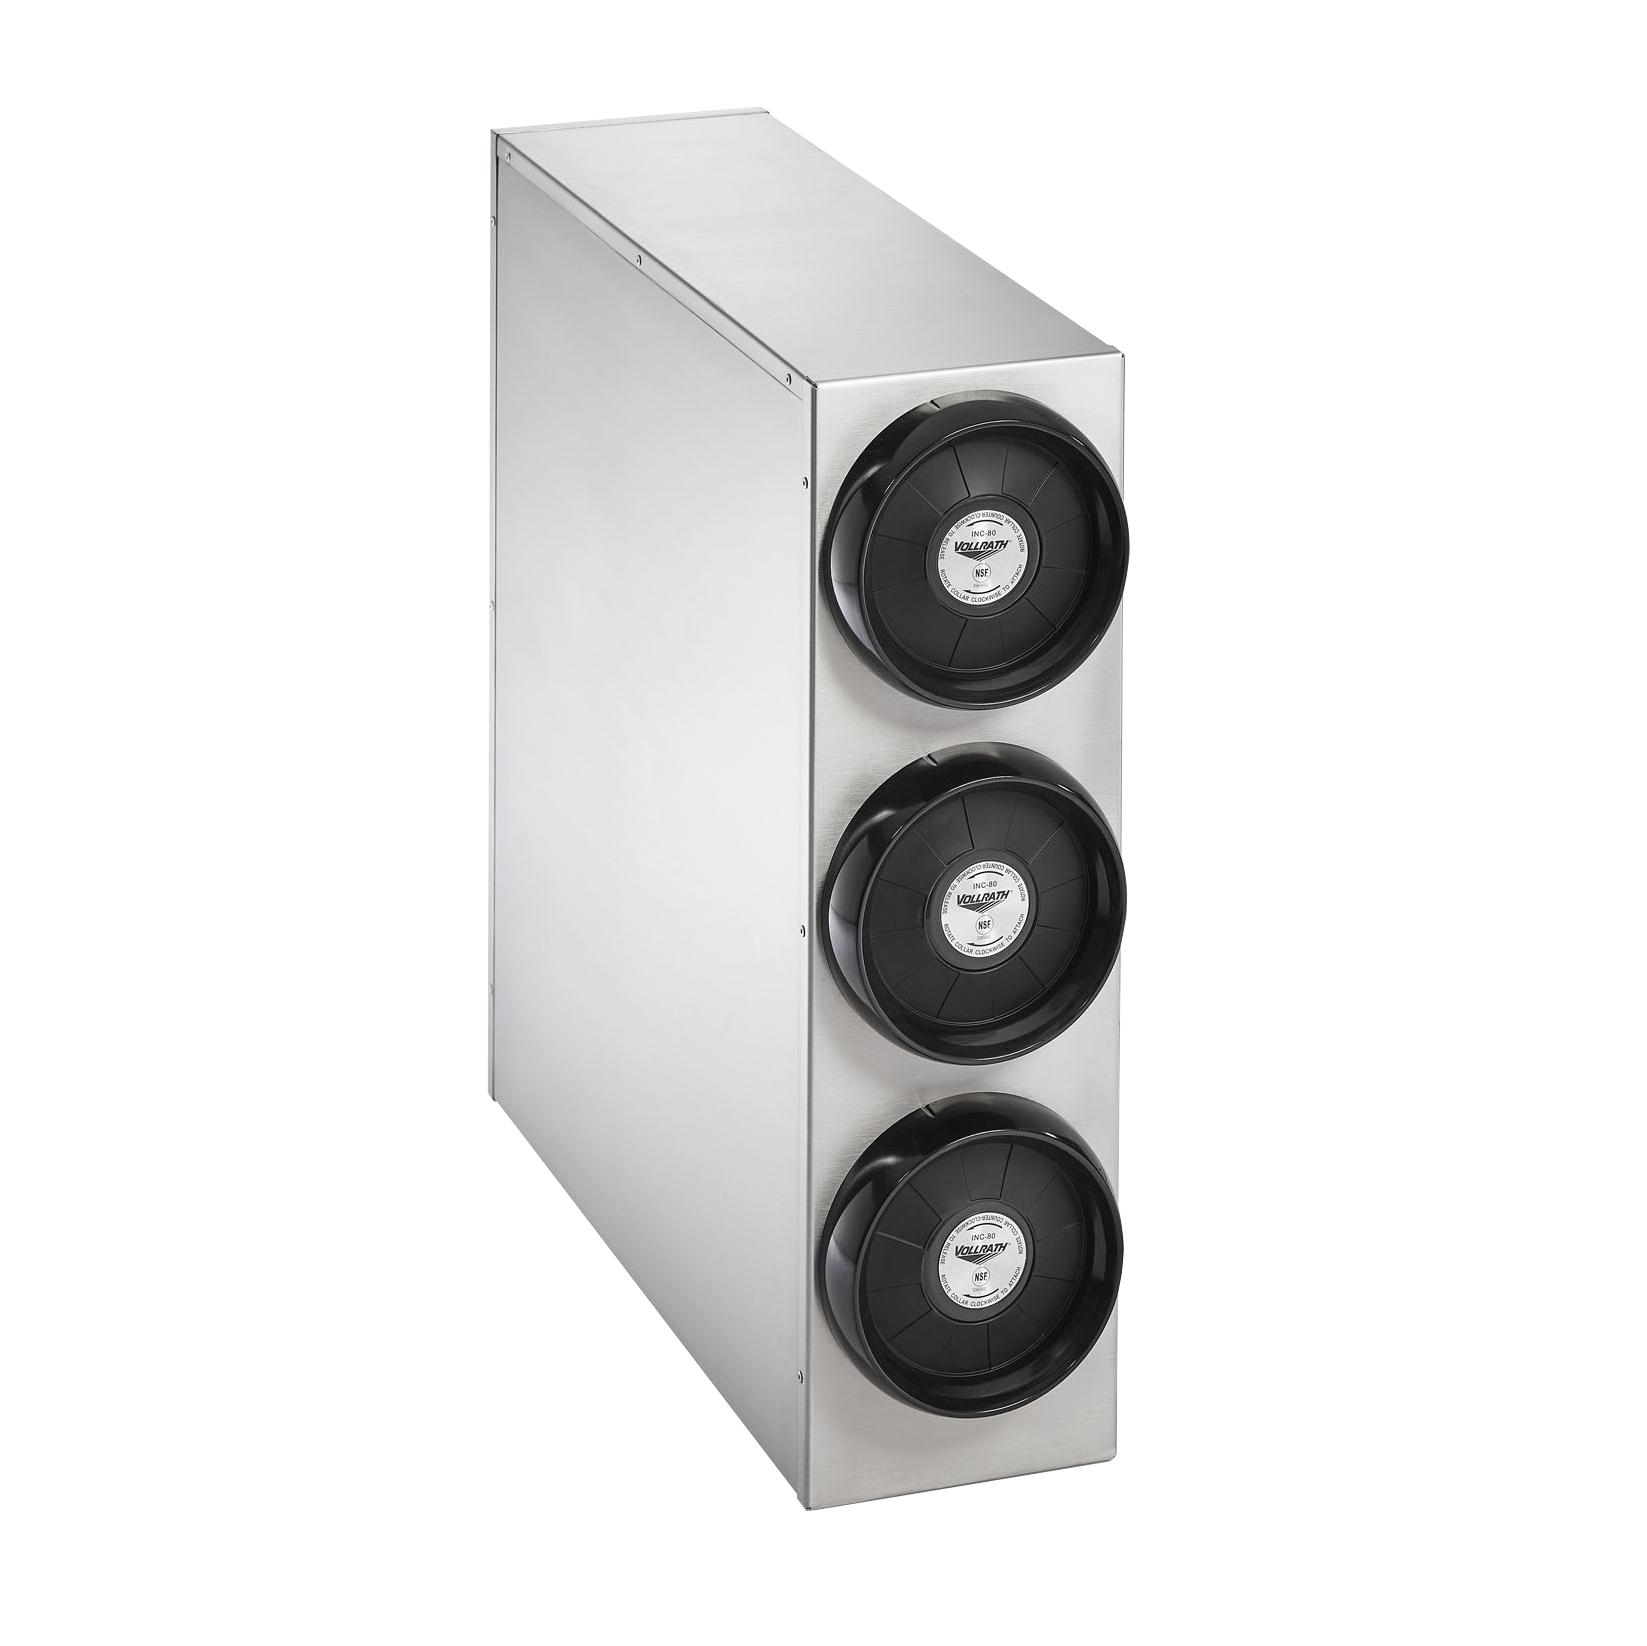 Vollrath 58823-A-A-A cup dispensers, countertop